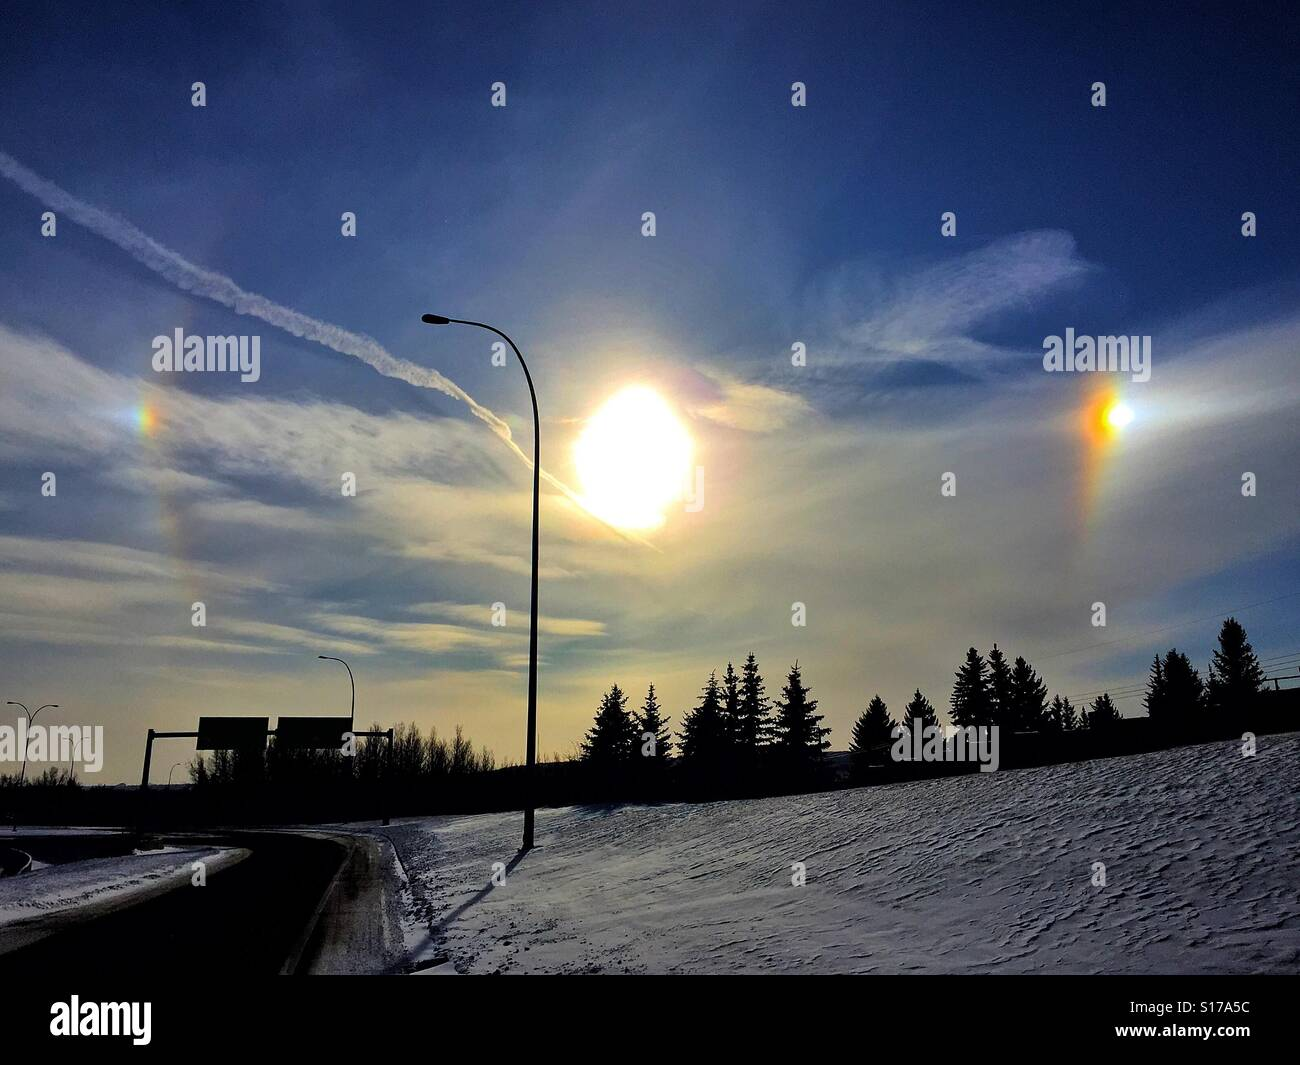 Bright sun, sun dogs, and jet stream - Stock Image